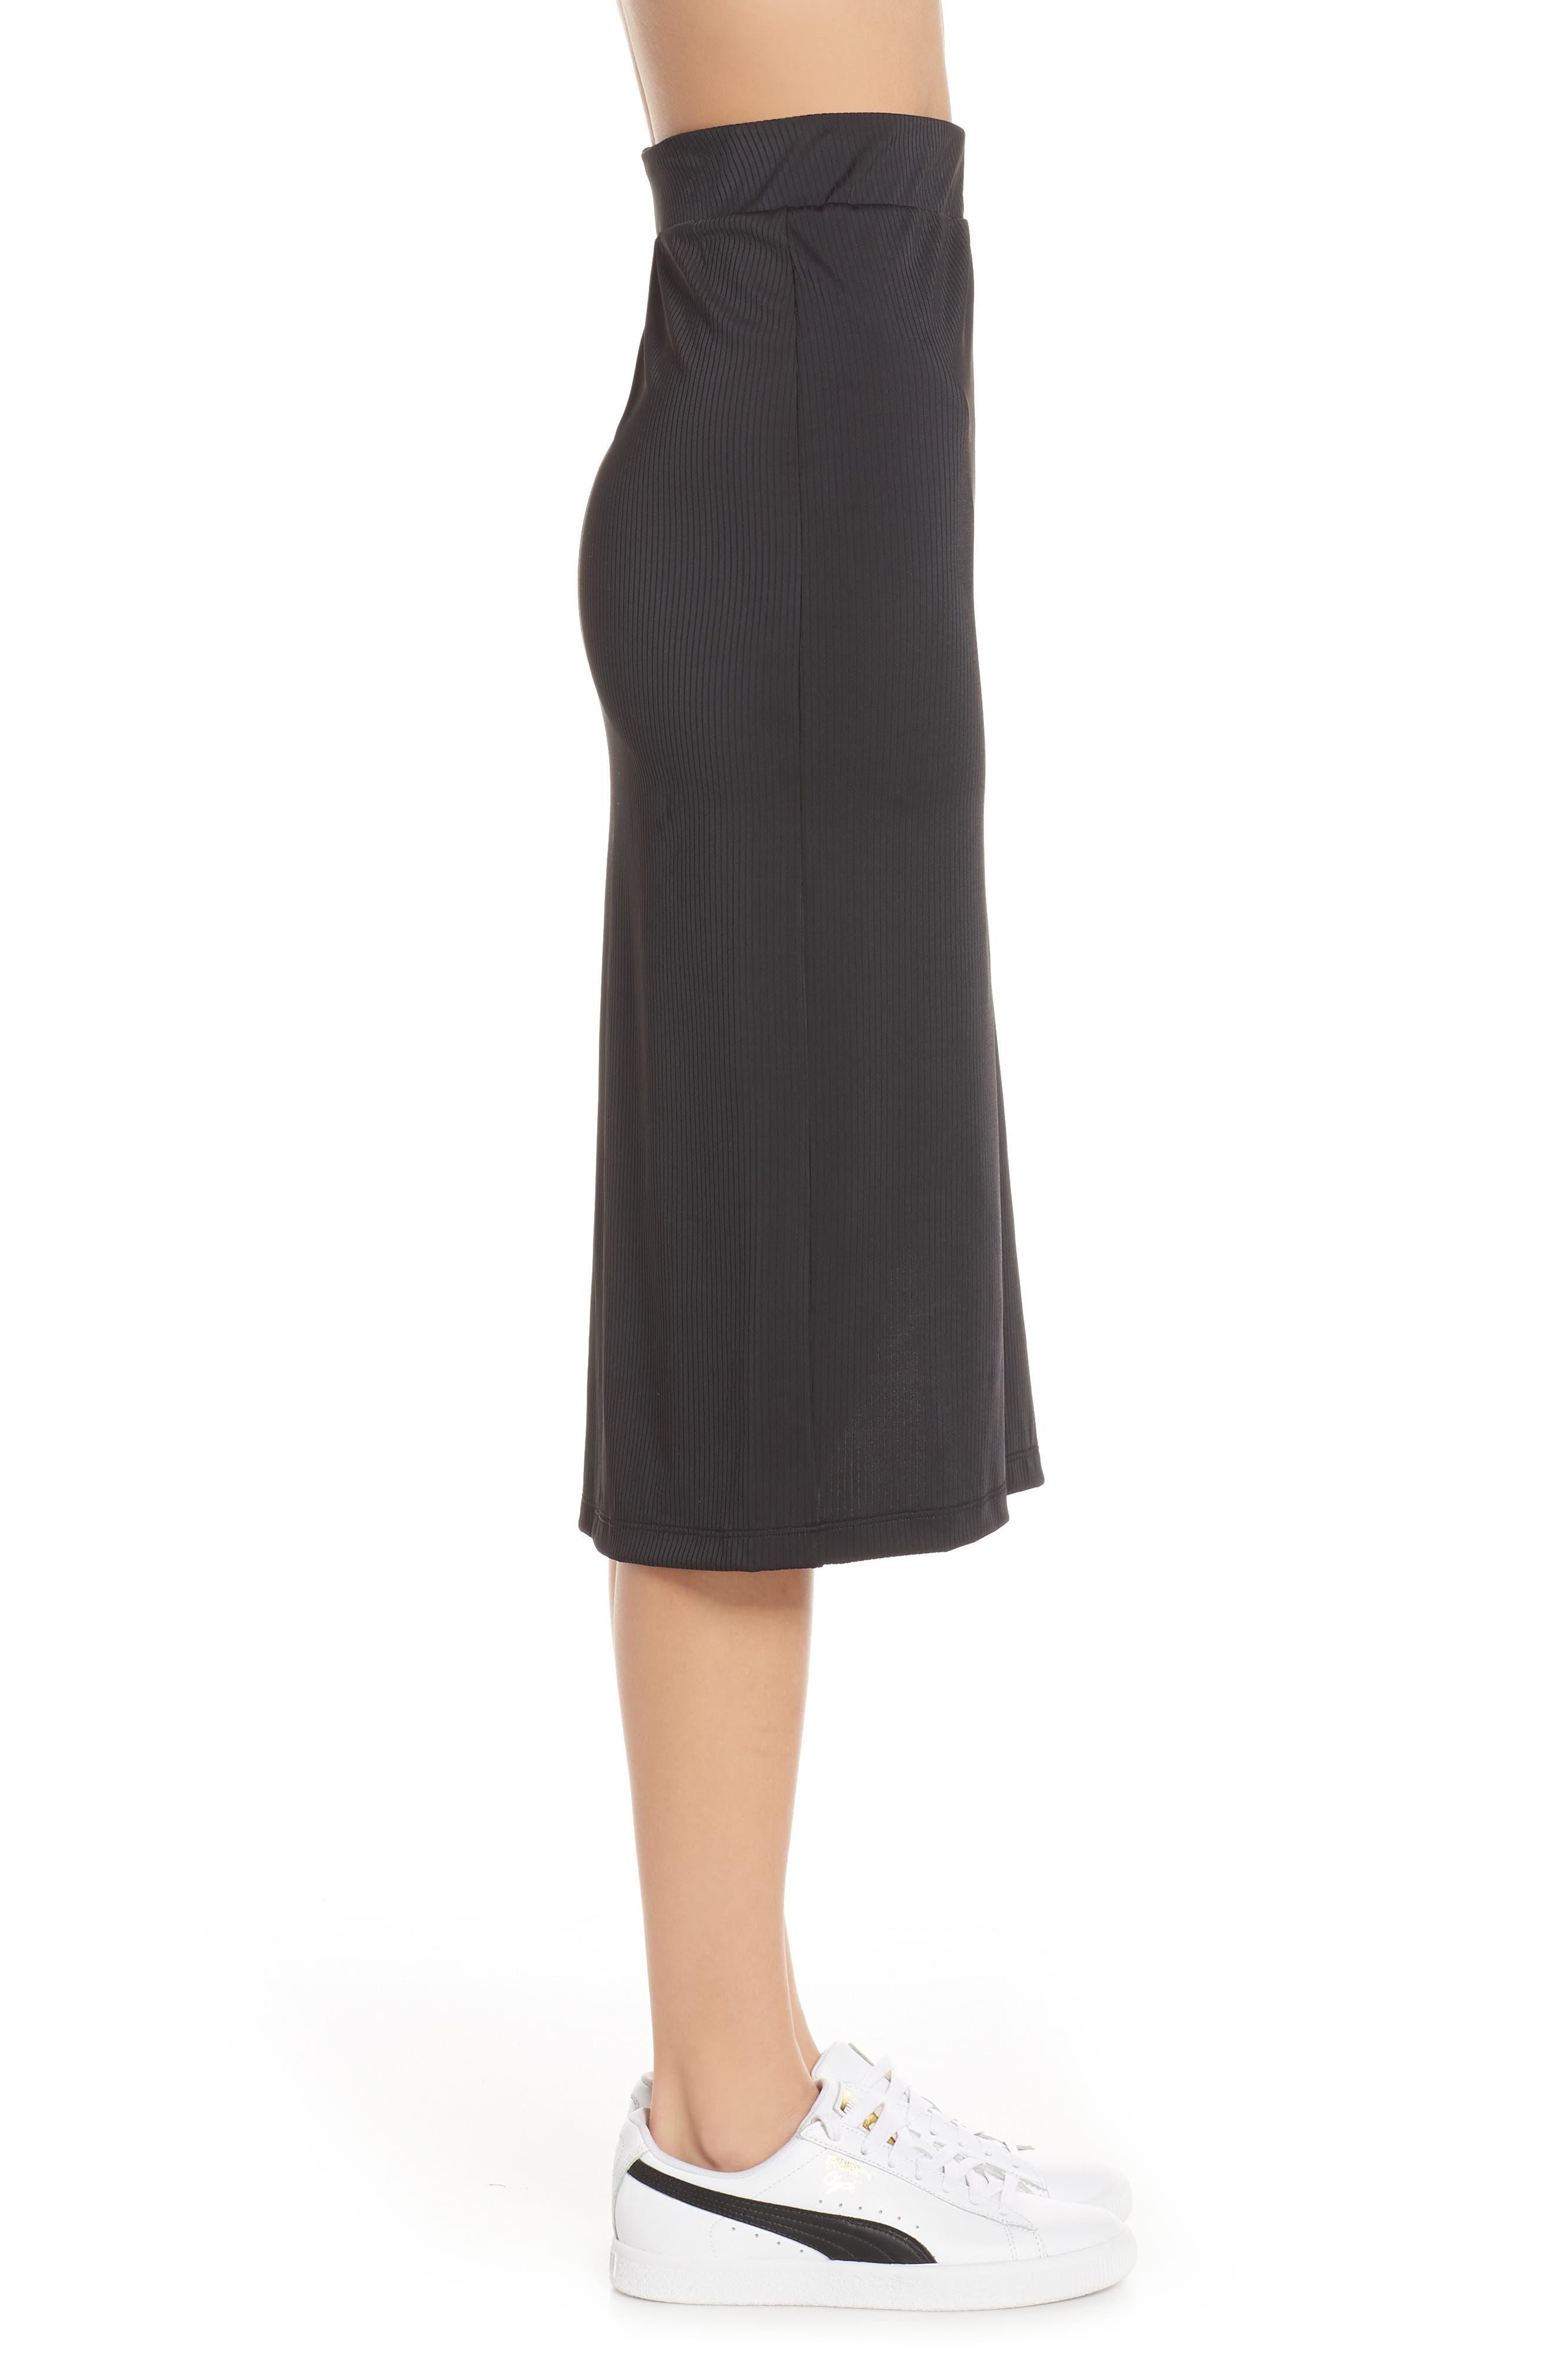 PUMA,                             Classics Ribbed Skirt,                             Alternate thumbnail 4, color,                             PUMA BLACK